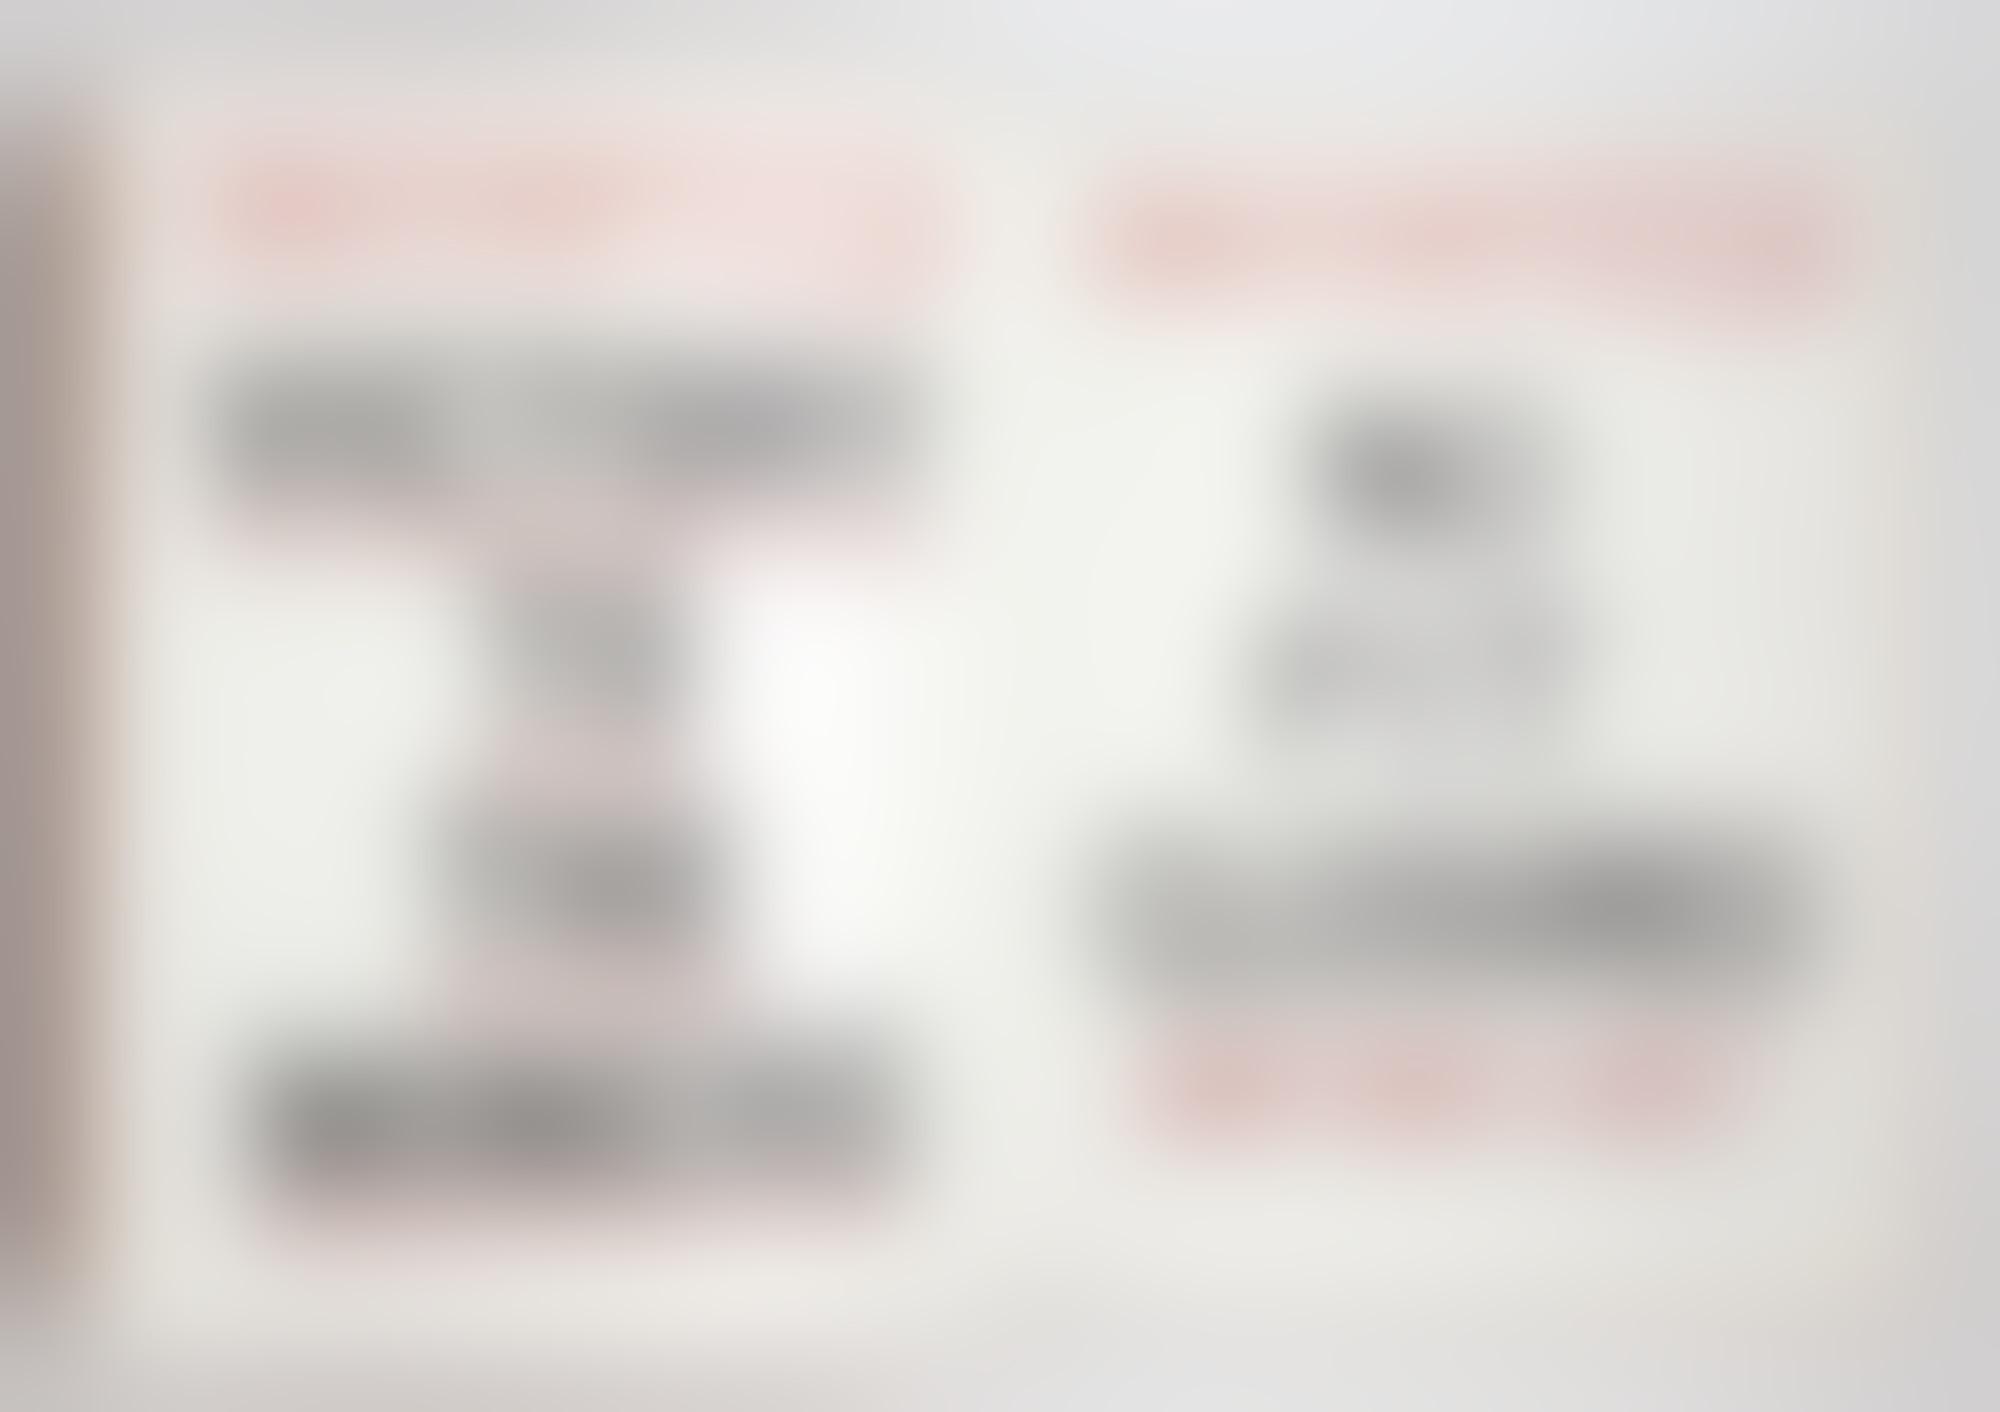 ILMW Spread Tools Posters 2 autocompressfitresizeixlibphp 1 1 0max h2000max w3 D2000q80sb236b23c2e0985aa58ddc5ce12ee7d51